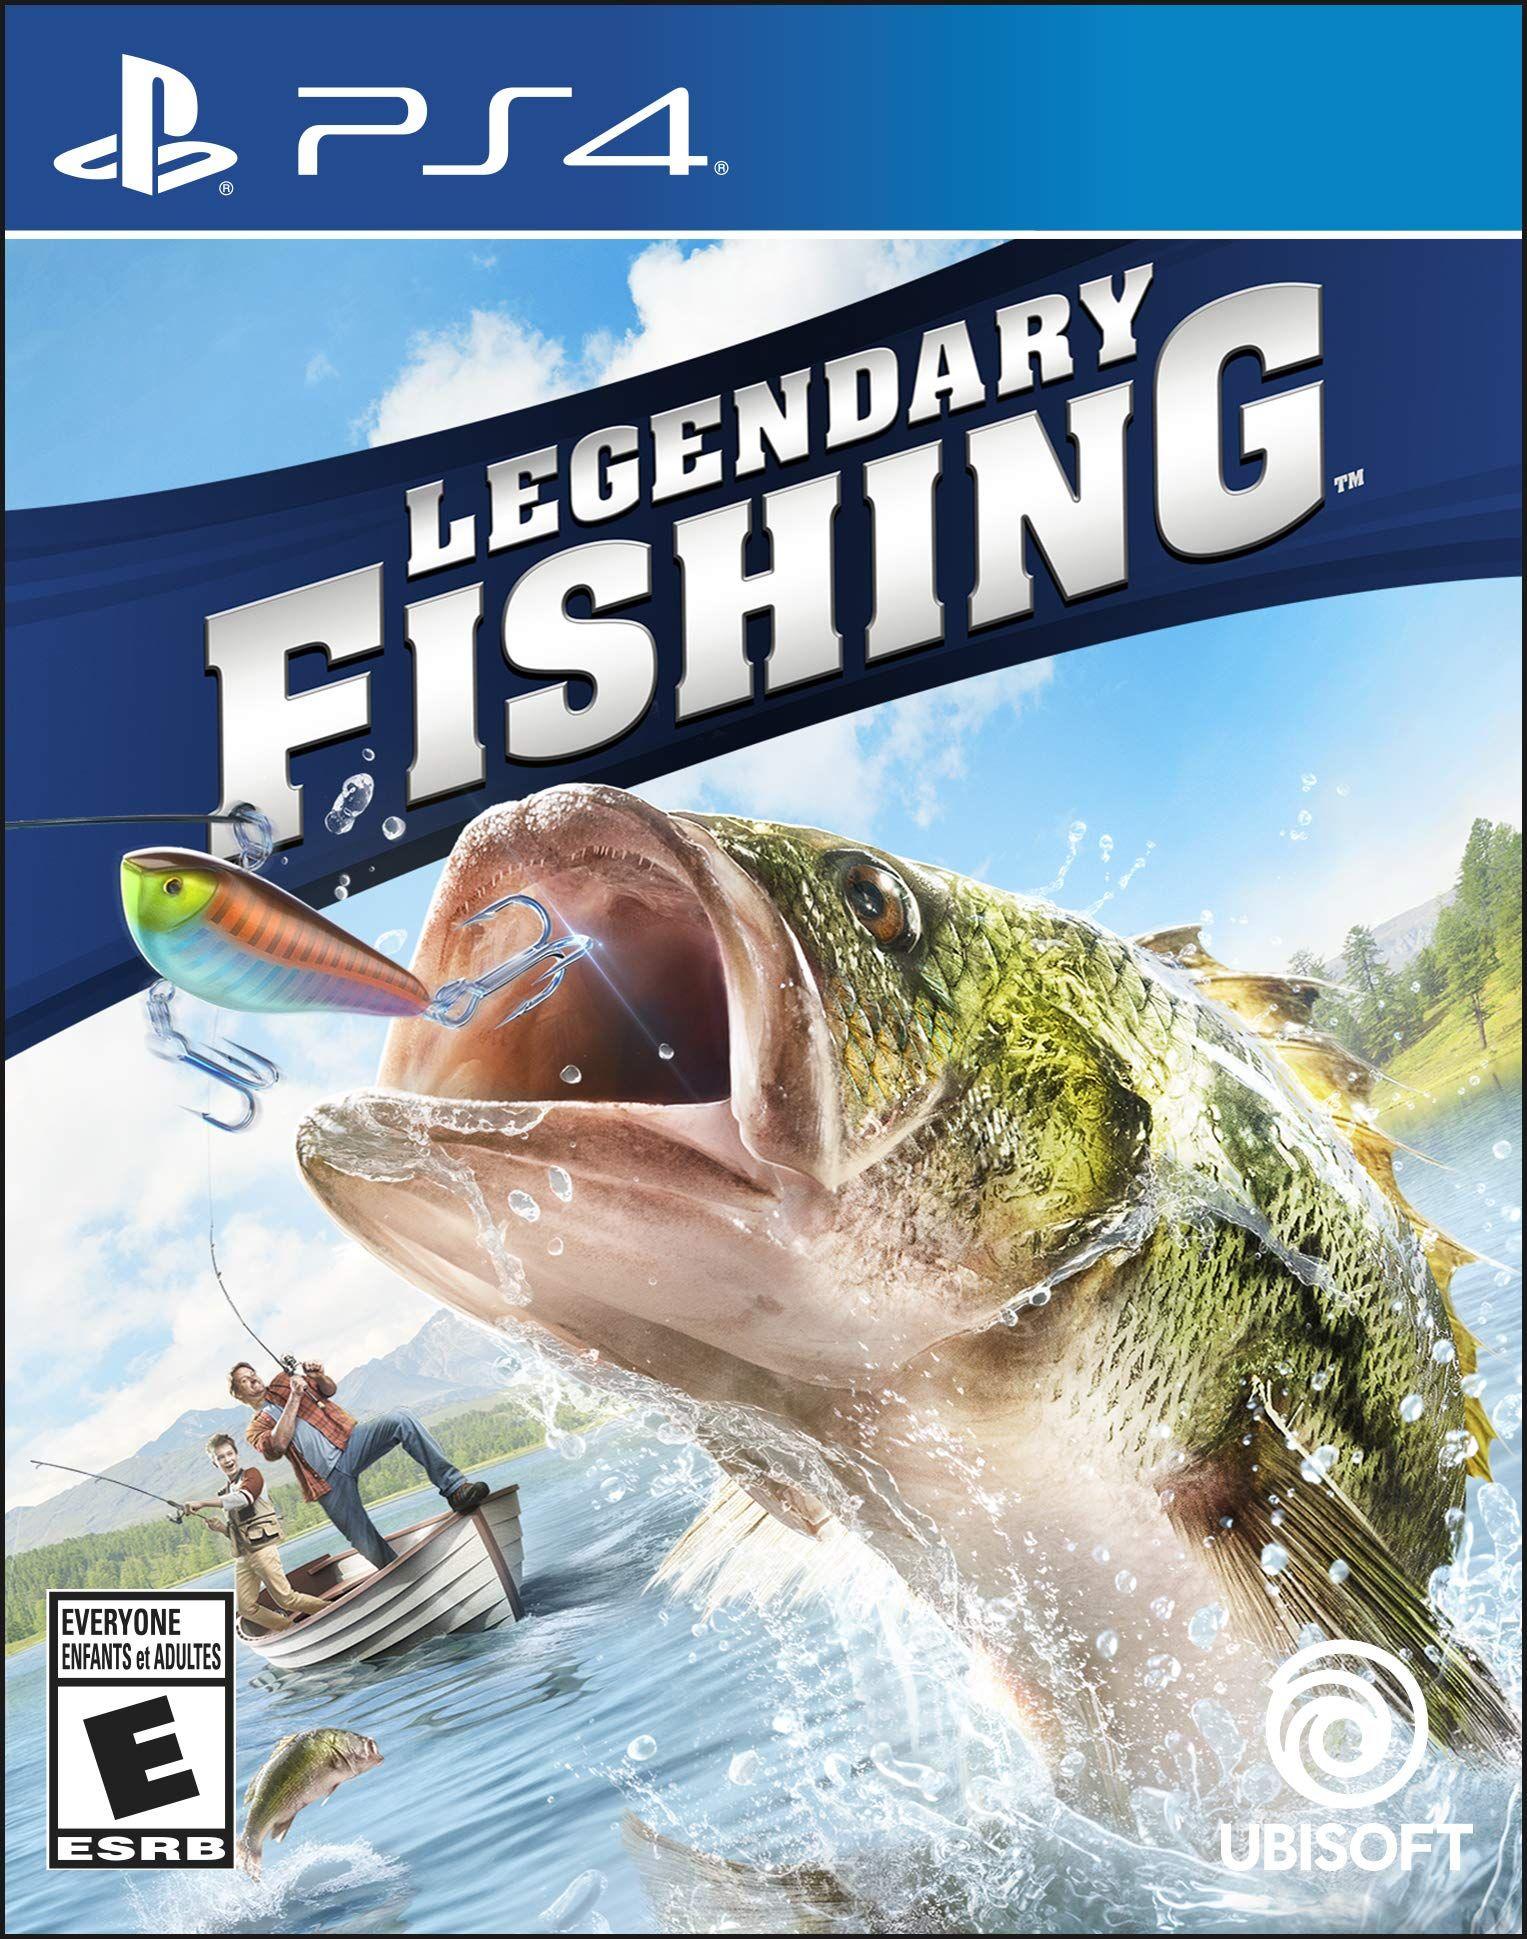 Legendary Fishing Playstation 4 Standard Edition Fishing Legendary Playstation Edition Playstation Fish Playstation 4